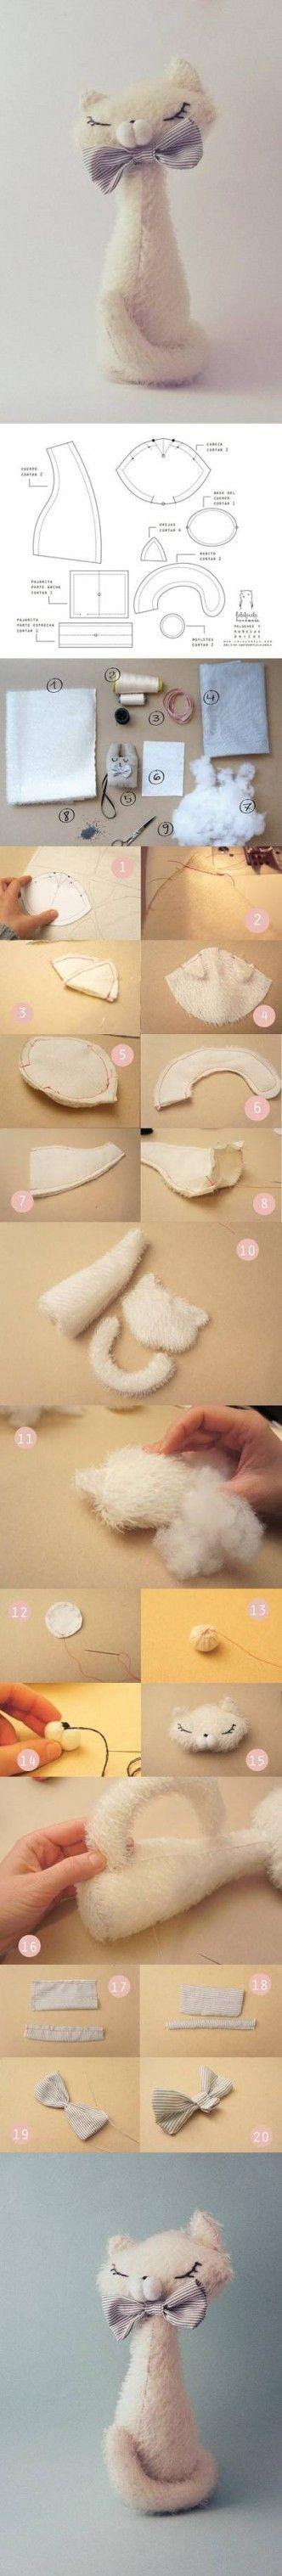 DIY Cat Plushie - FREE Pattern and Tutorial http://www.usefuldiy.com/page/8/